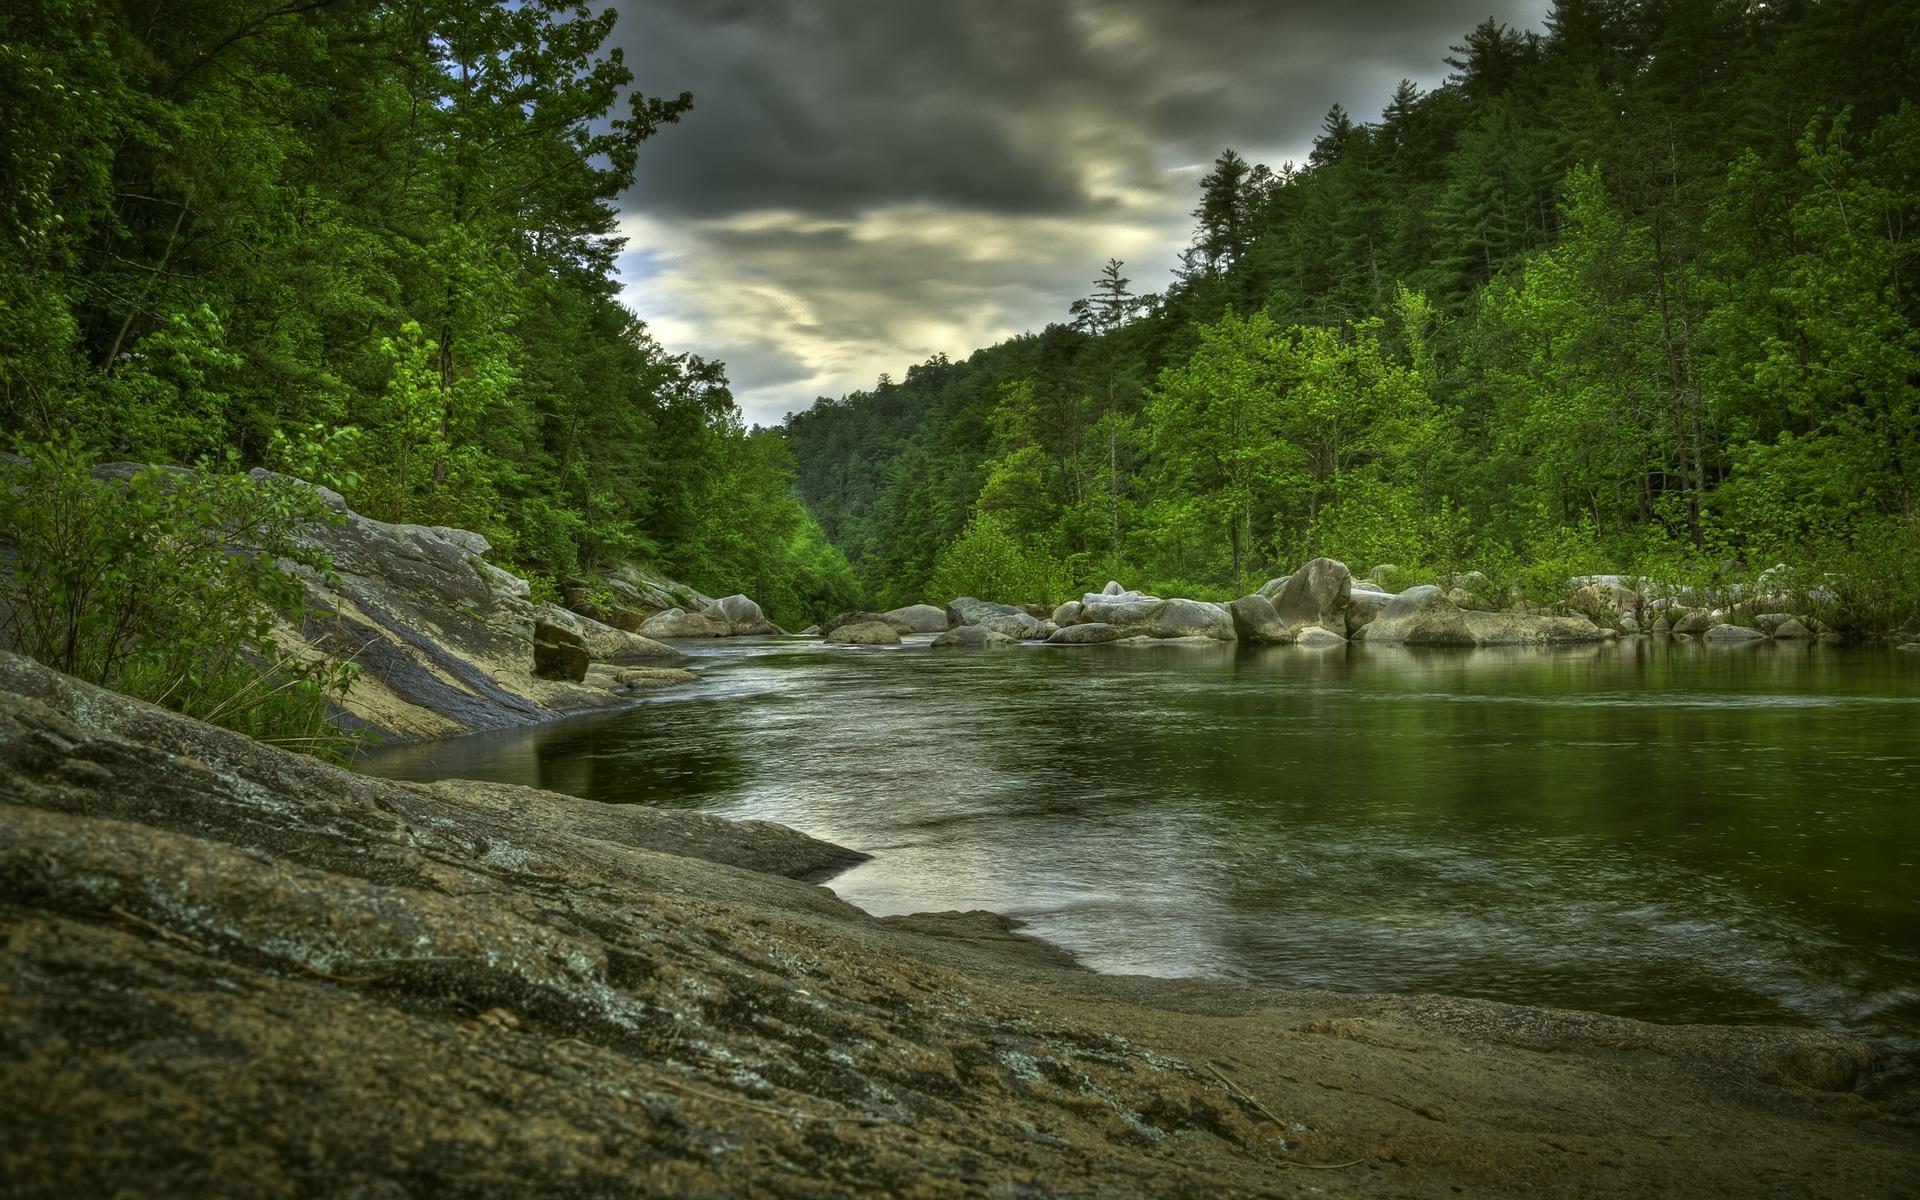 wilsons creek springfield missouri usa nature wallpaper 1920x1200 876 1920x1200